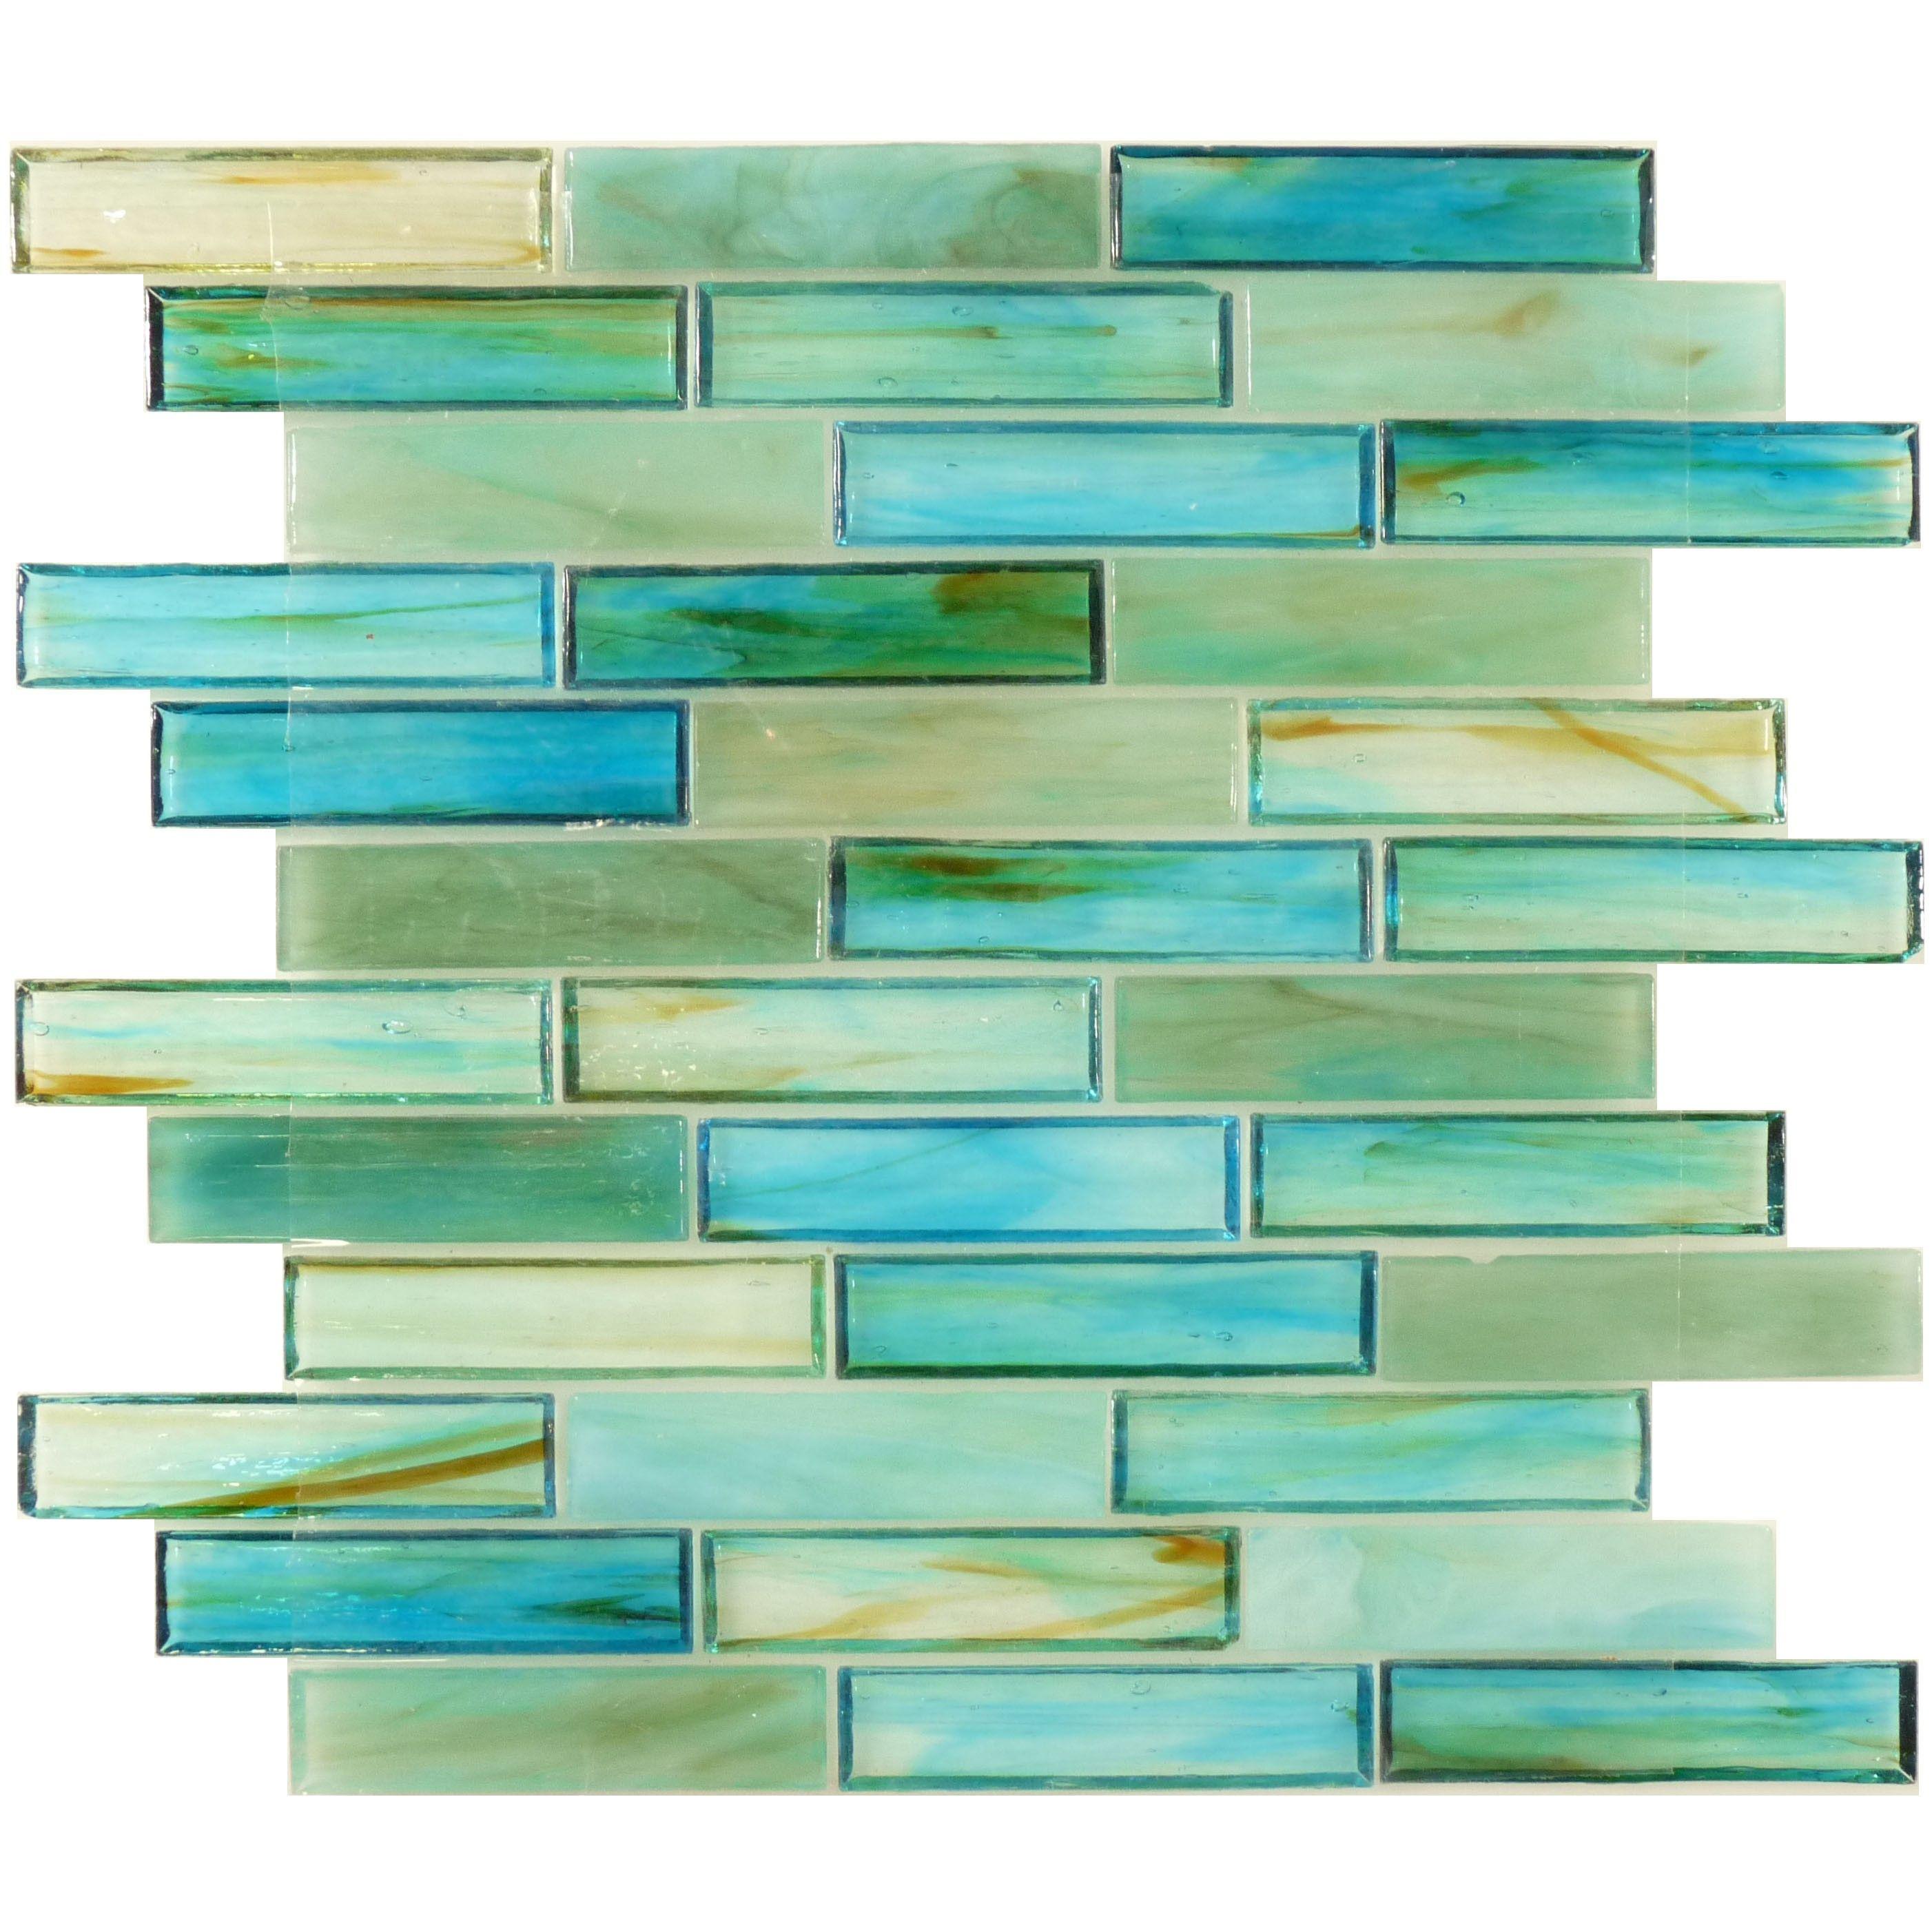 Tropical Caribbean Green Glass Tile 1 X 4 For Pool Or Bathroom Green Backsplash Kitchen Tiles Backsplash Sea Glass Tile